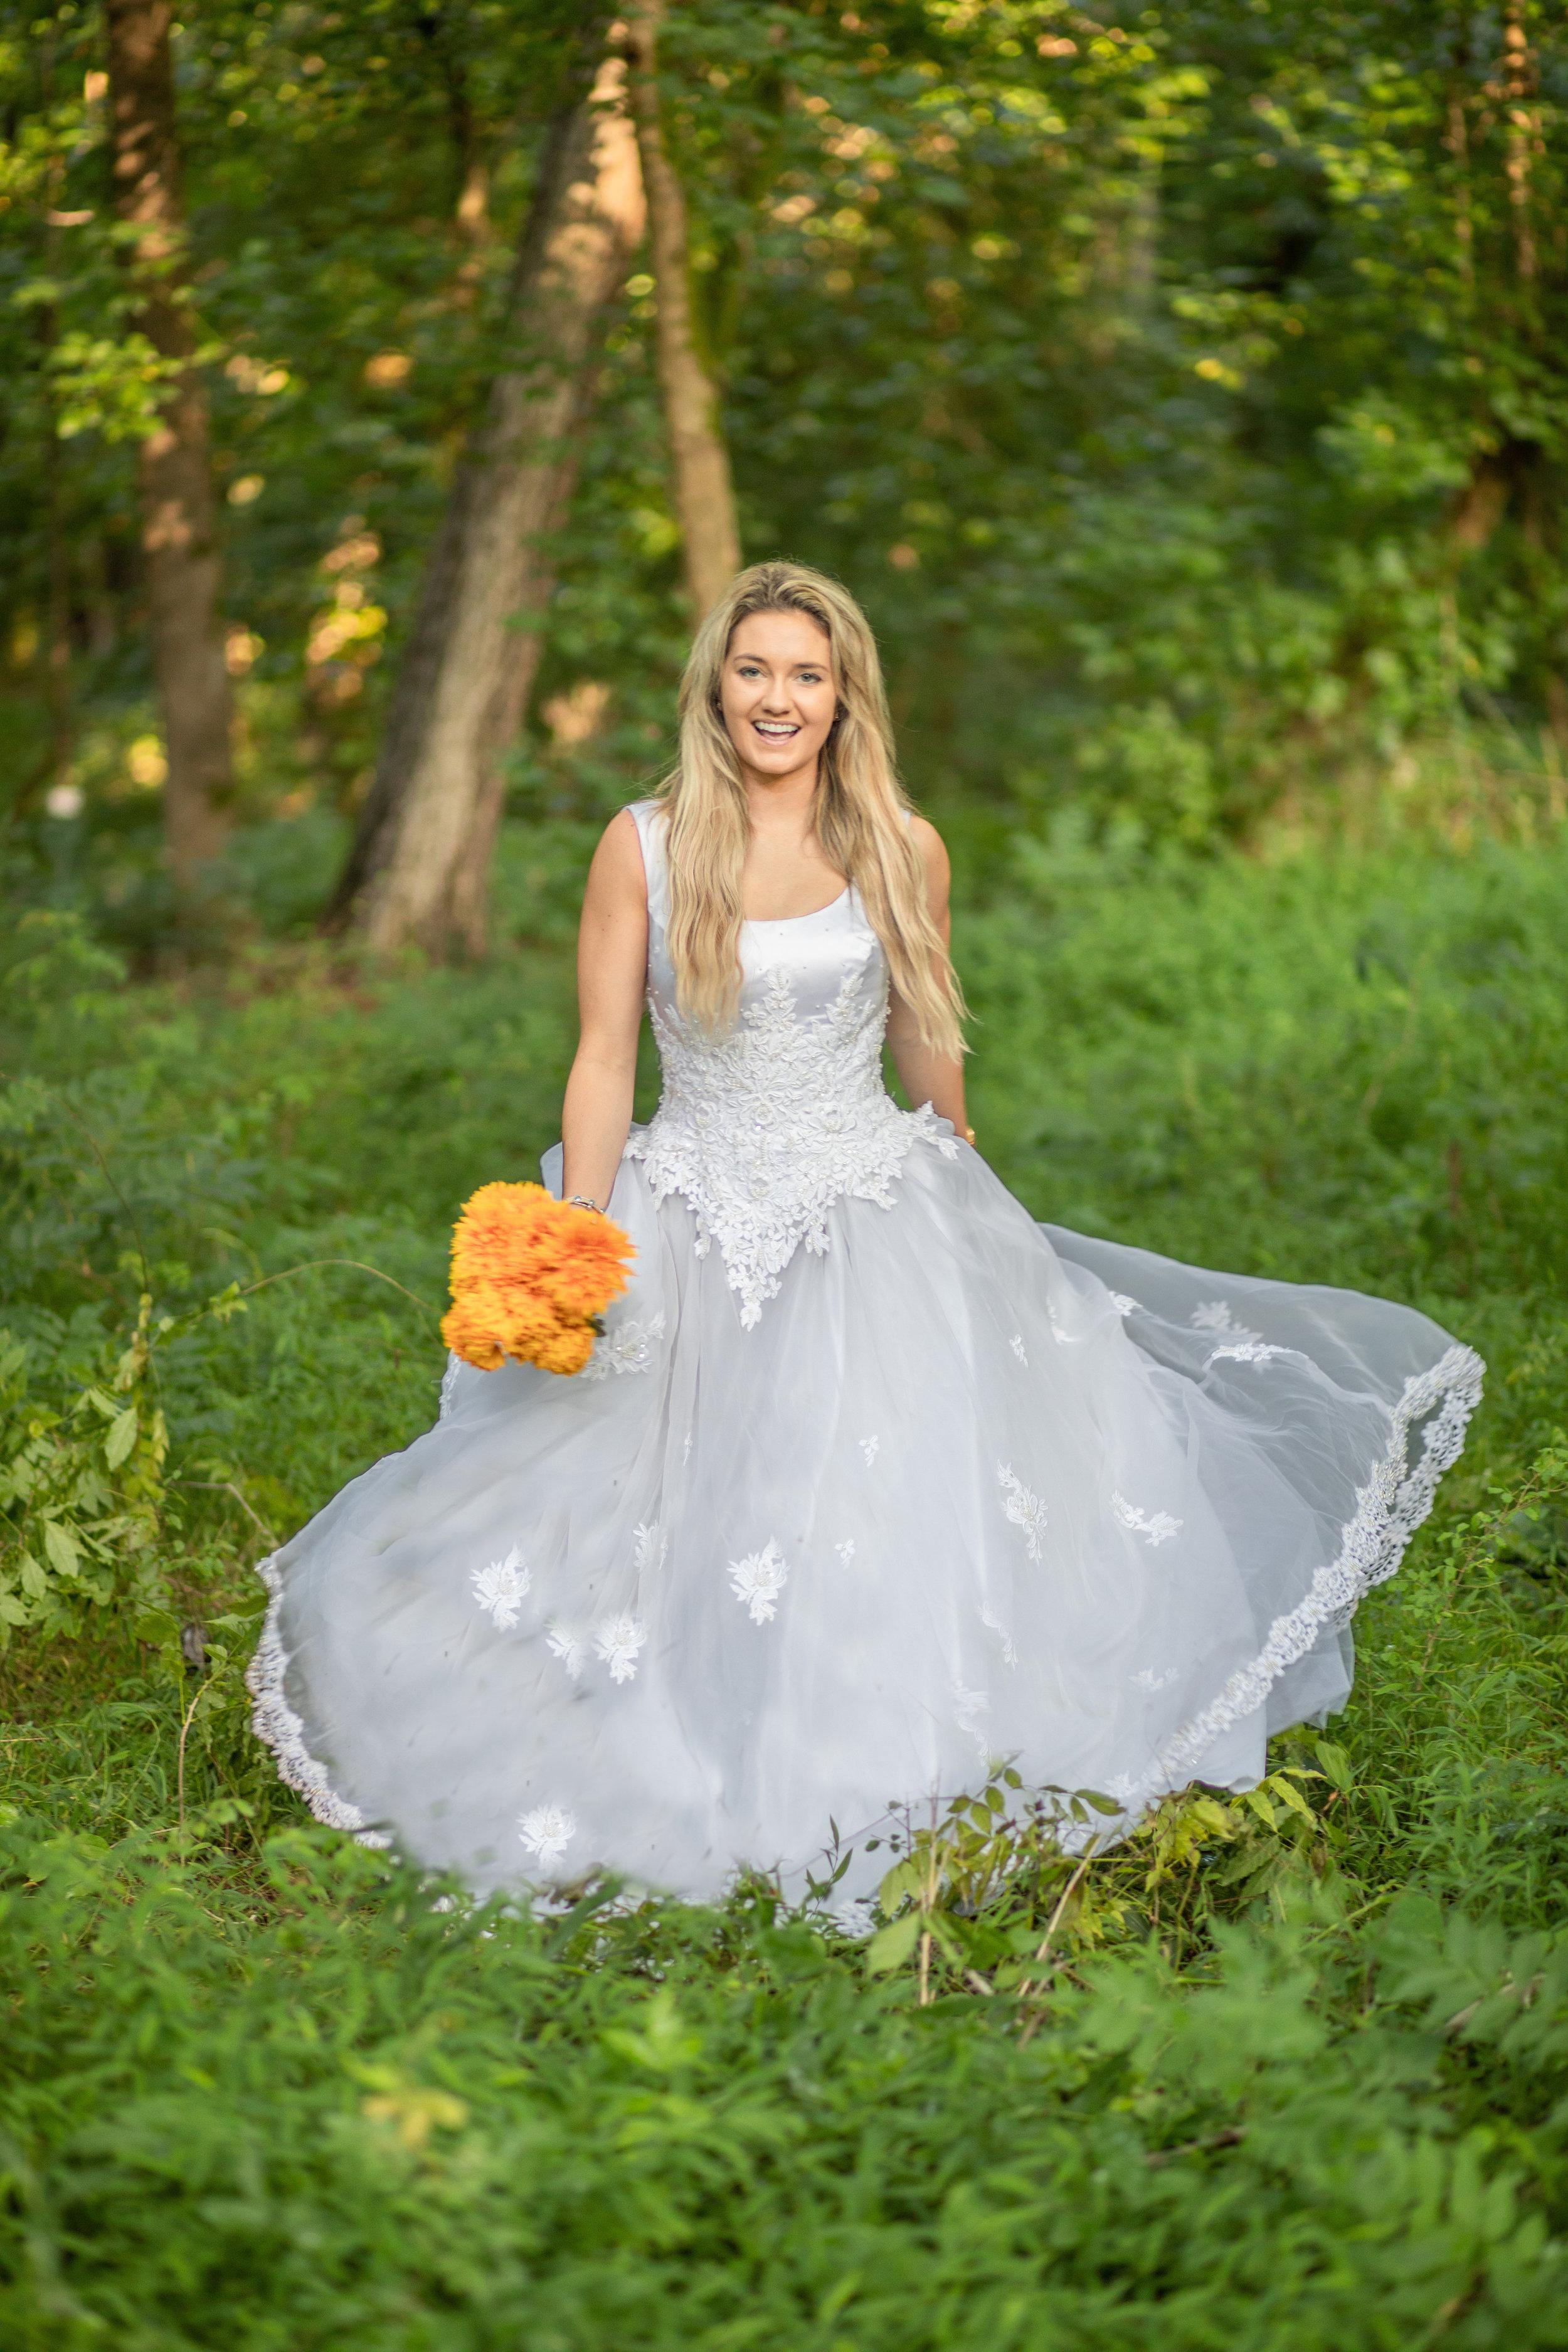 Shot by the Atlanta Wedding Photographers at AtlantaArtisticWeddings Emory Lullwater Park